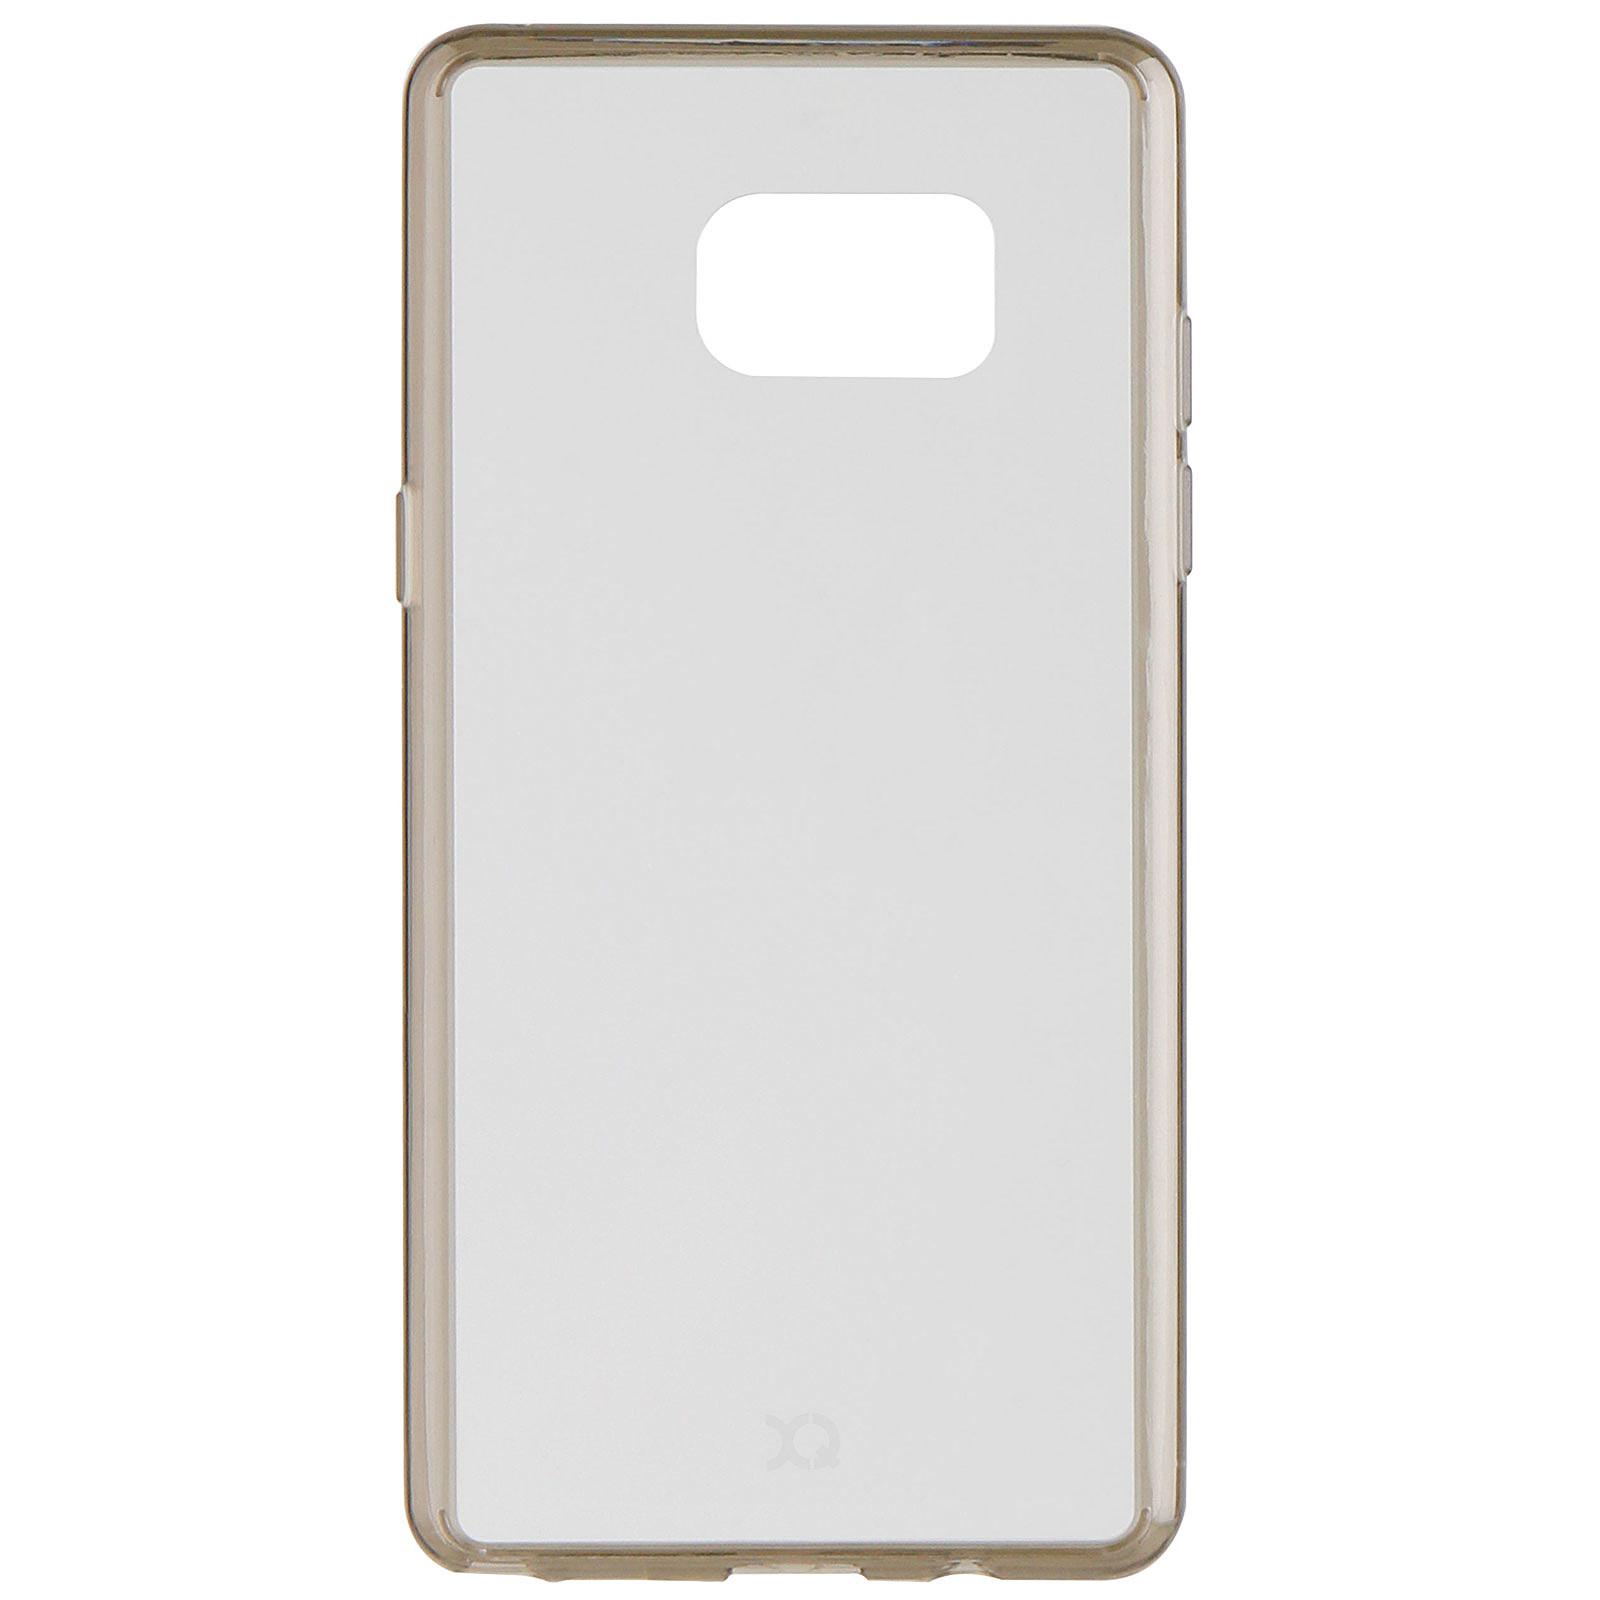 xqisit Coque Odet transparente/grise Galaxy Note 7